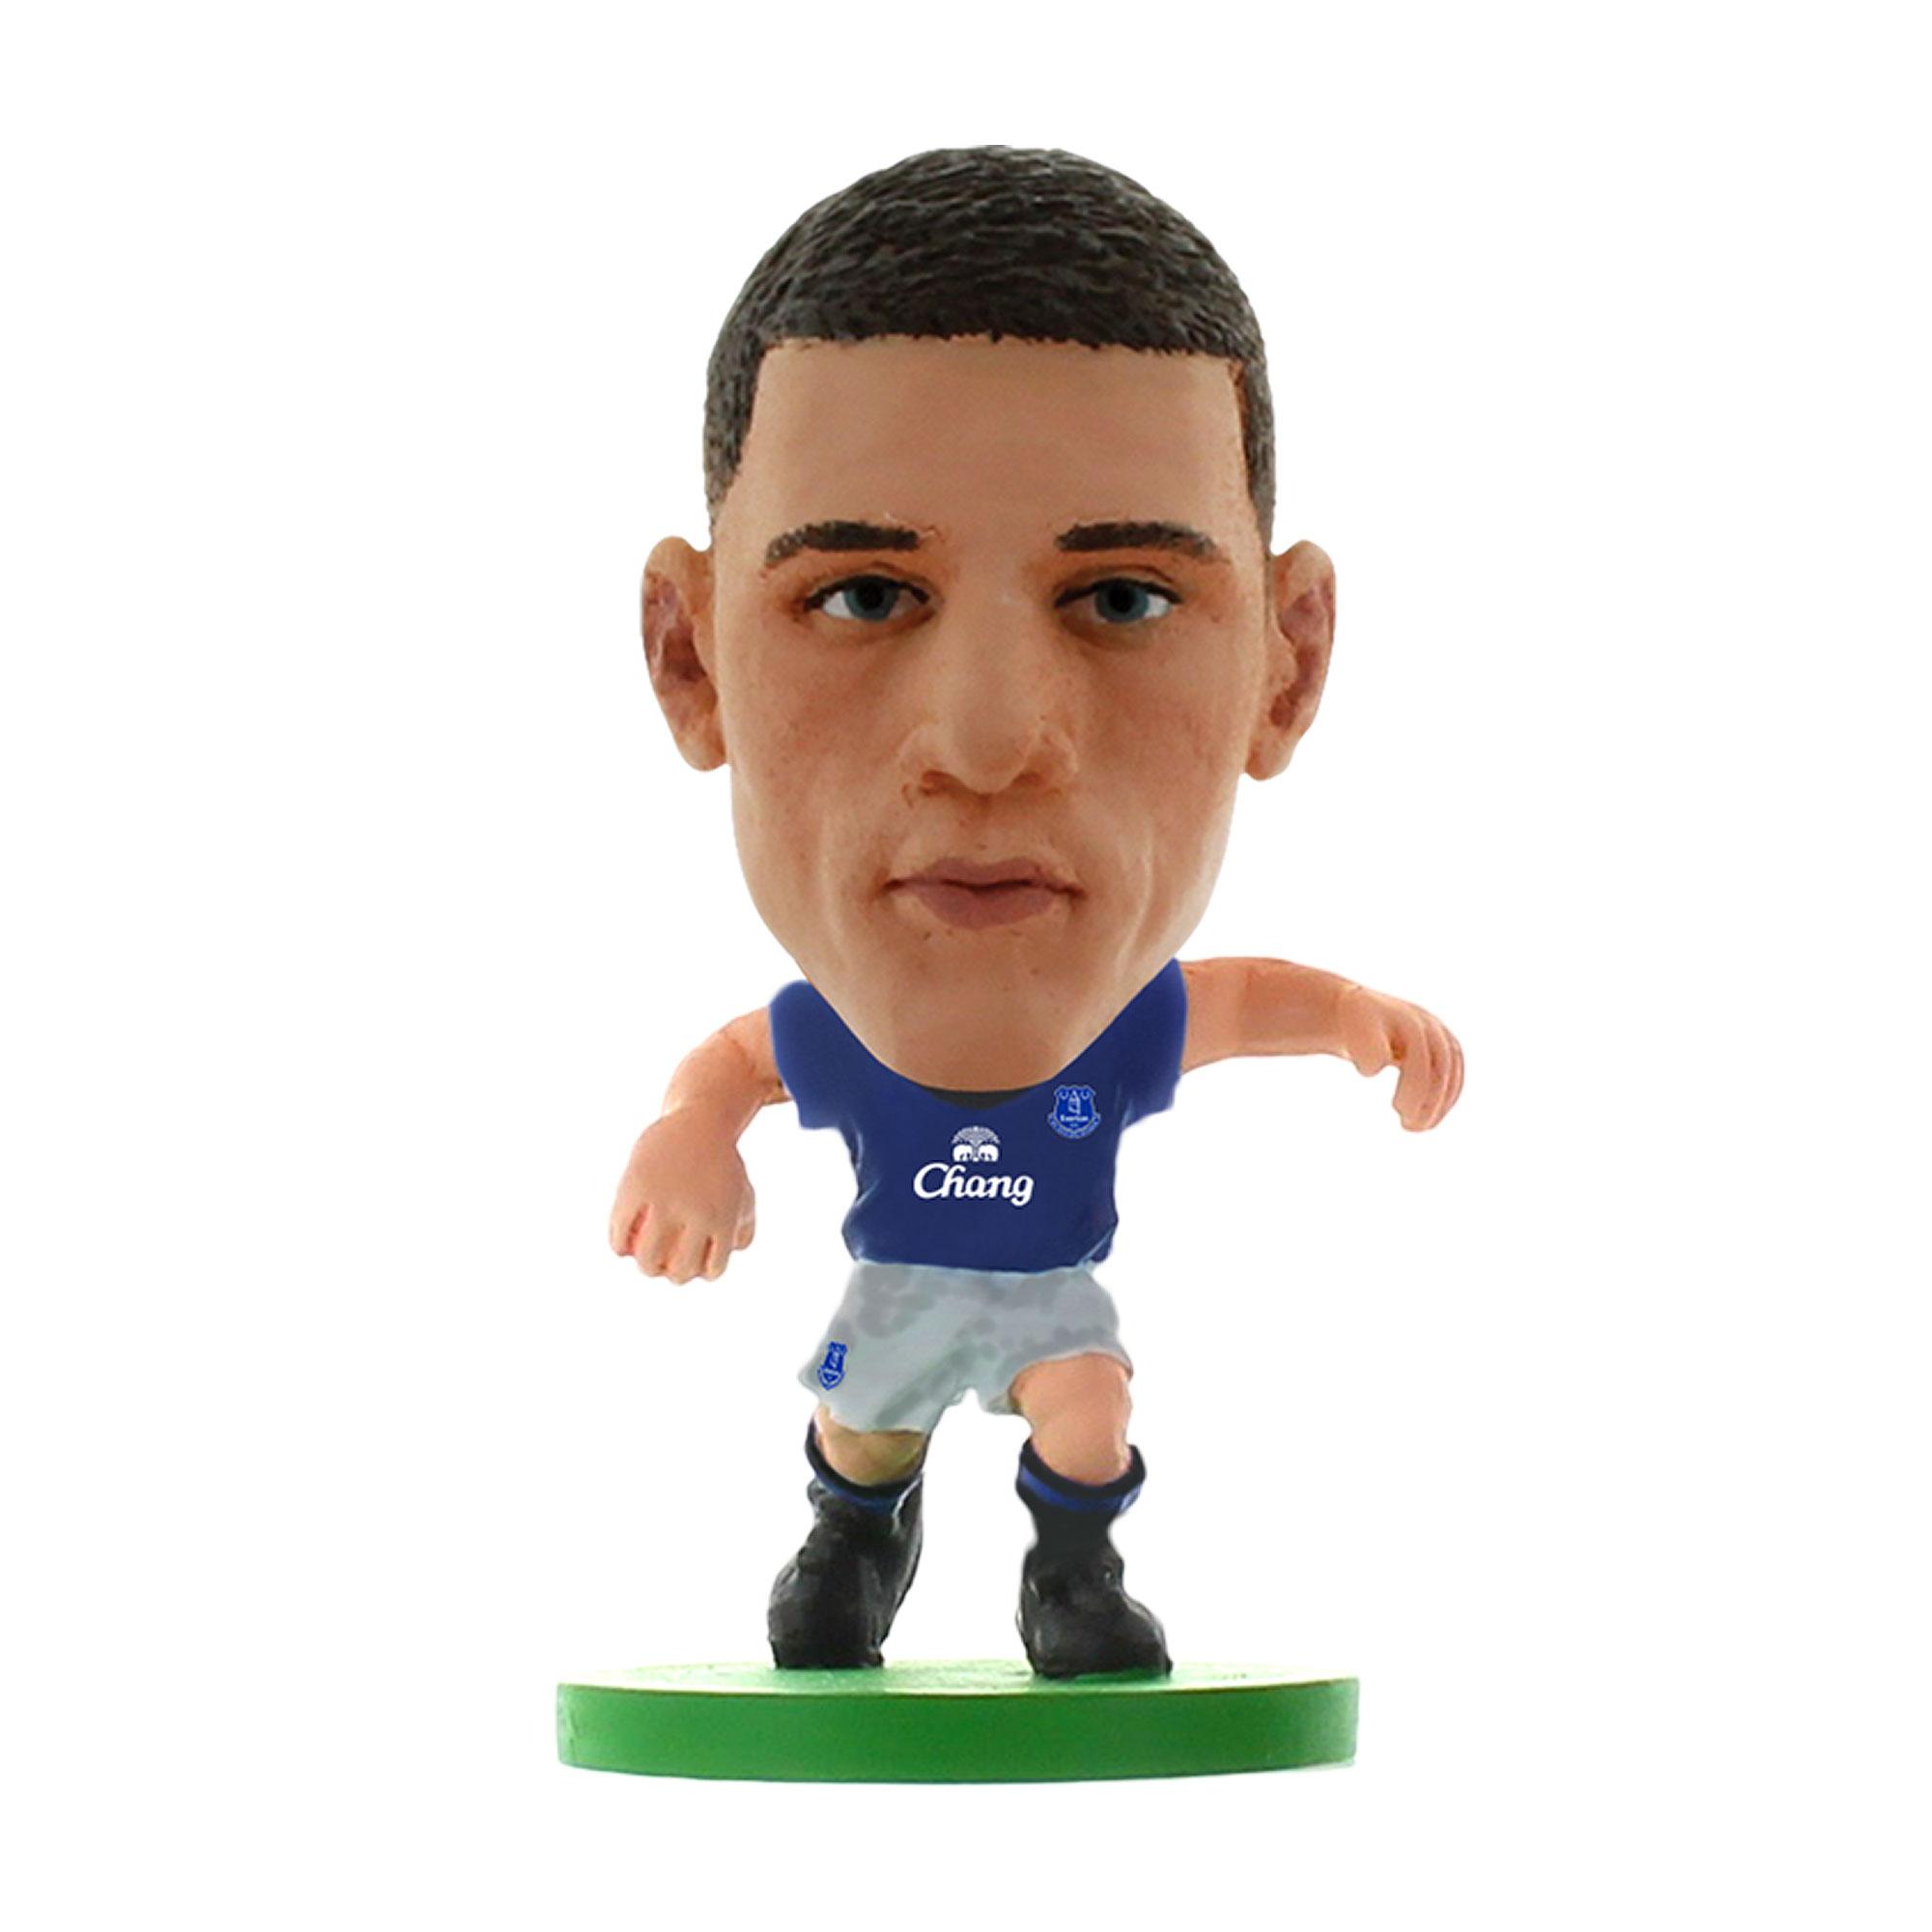 Everton Soccerstarz Barkley 14-15 Home Kit